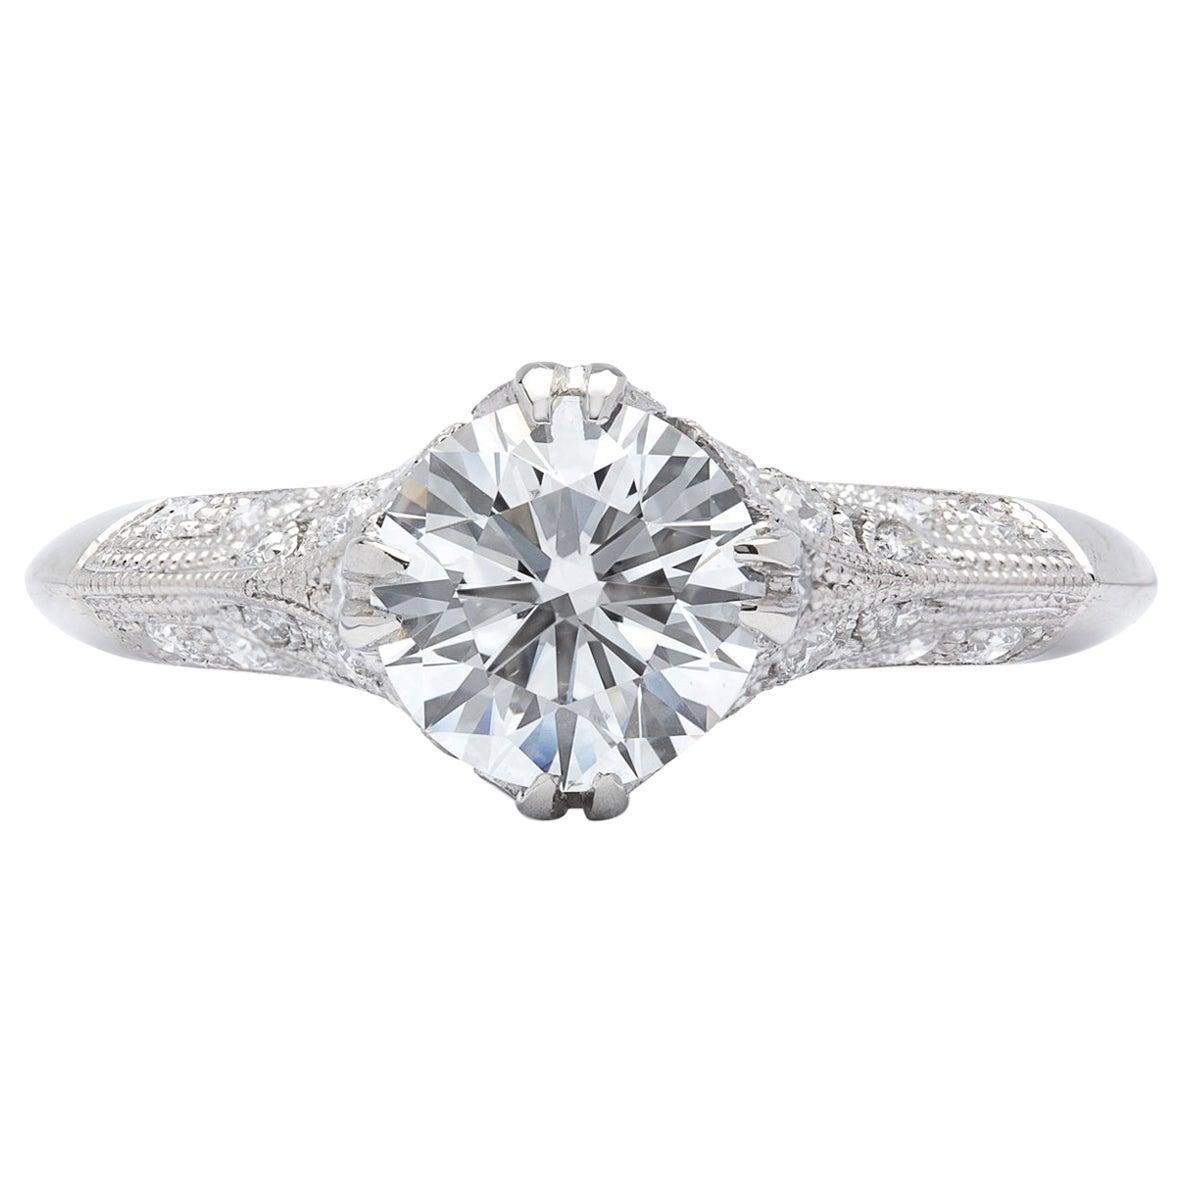 GIA 1.26 Carat F/VS2 Diamond Engagement Ring